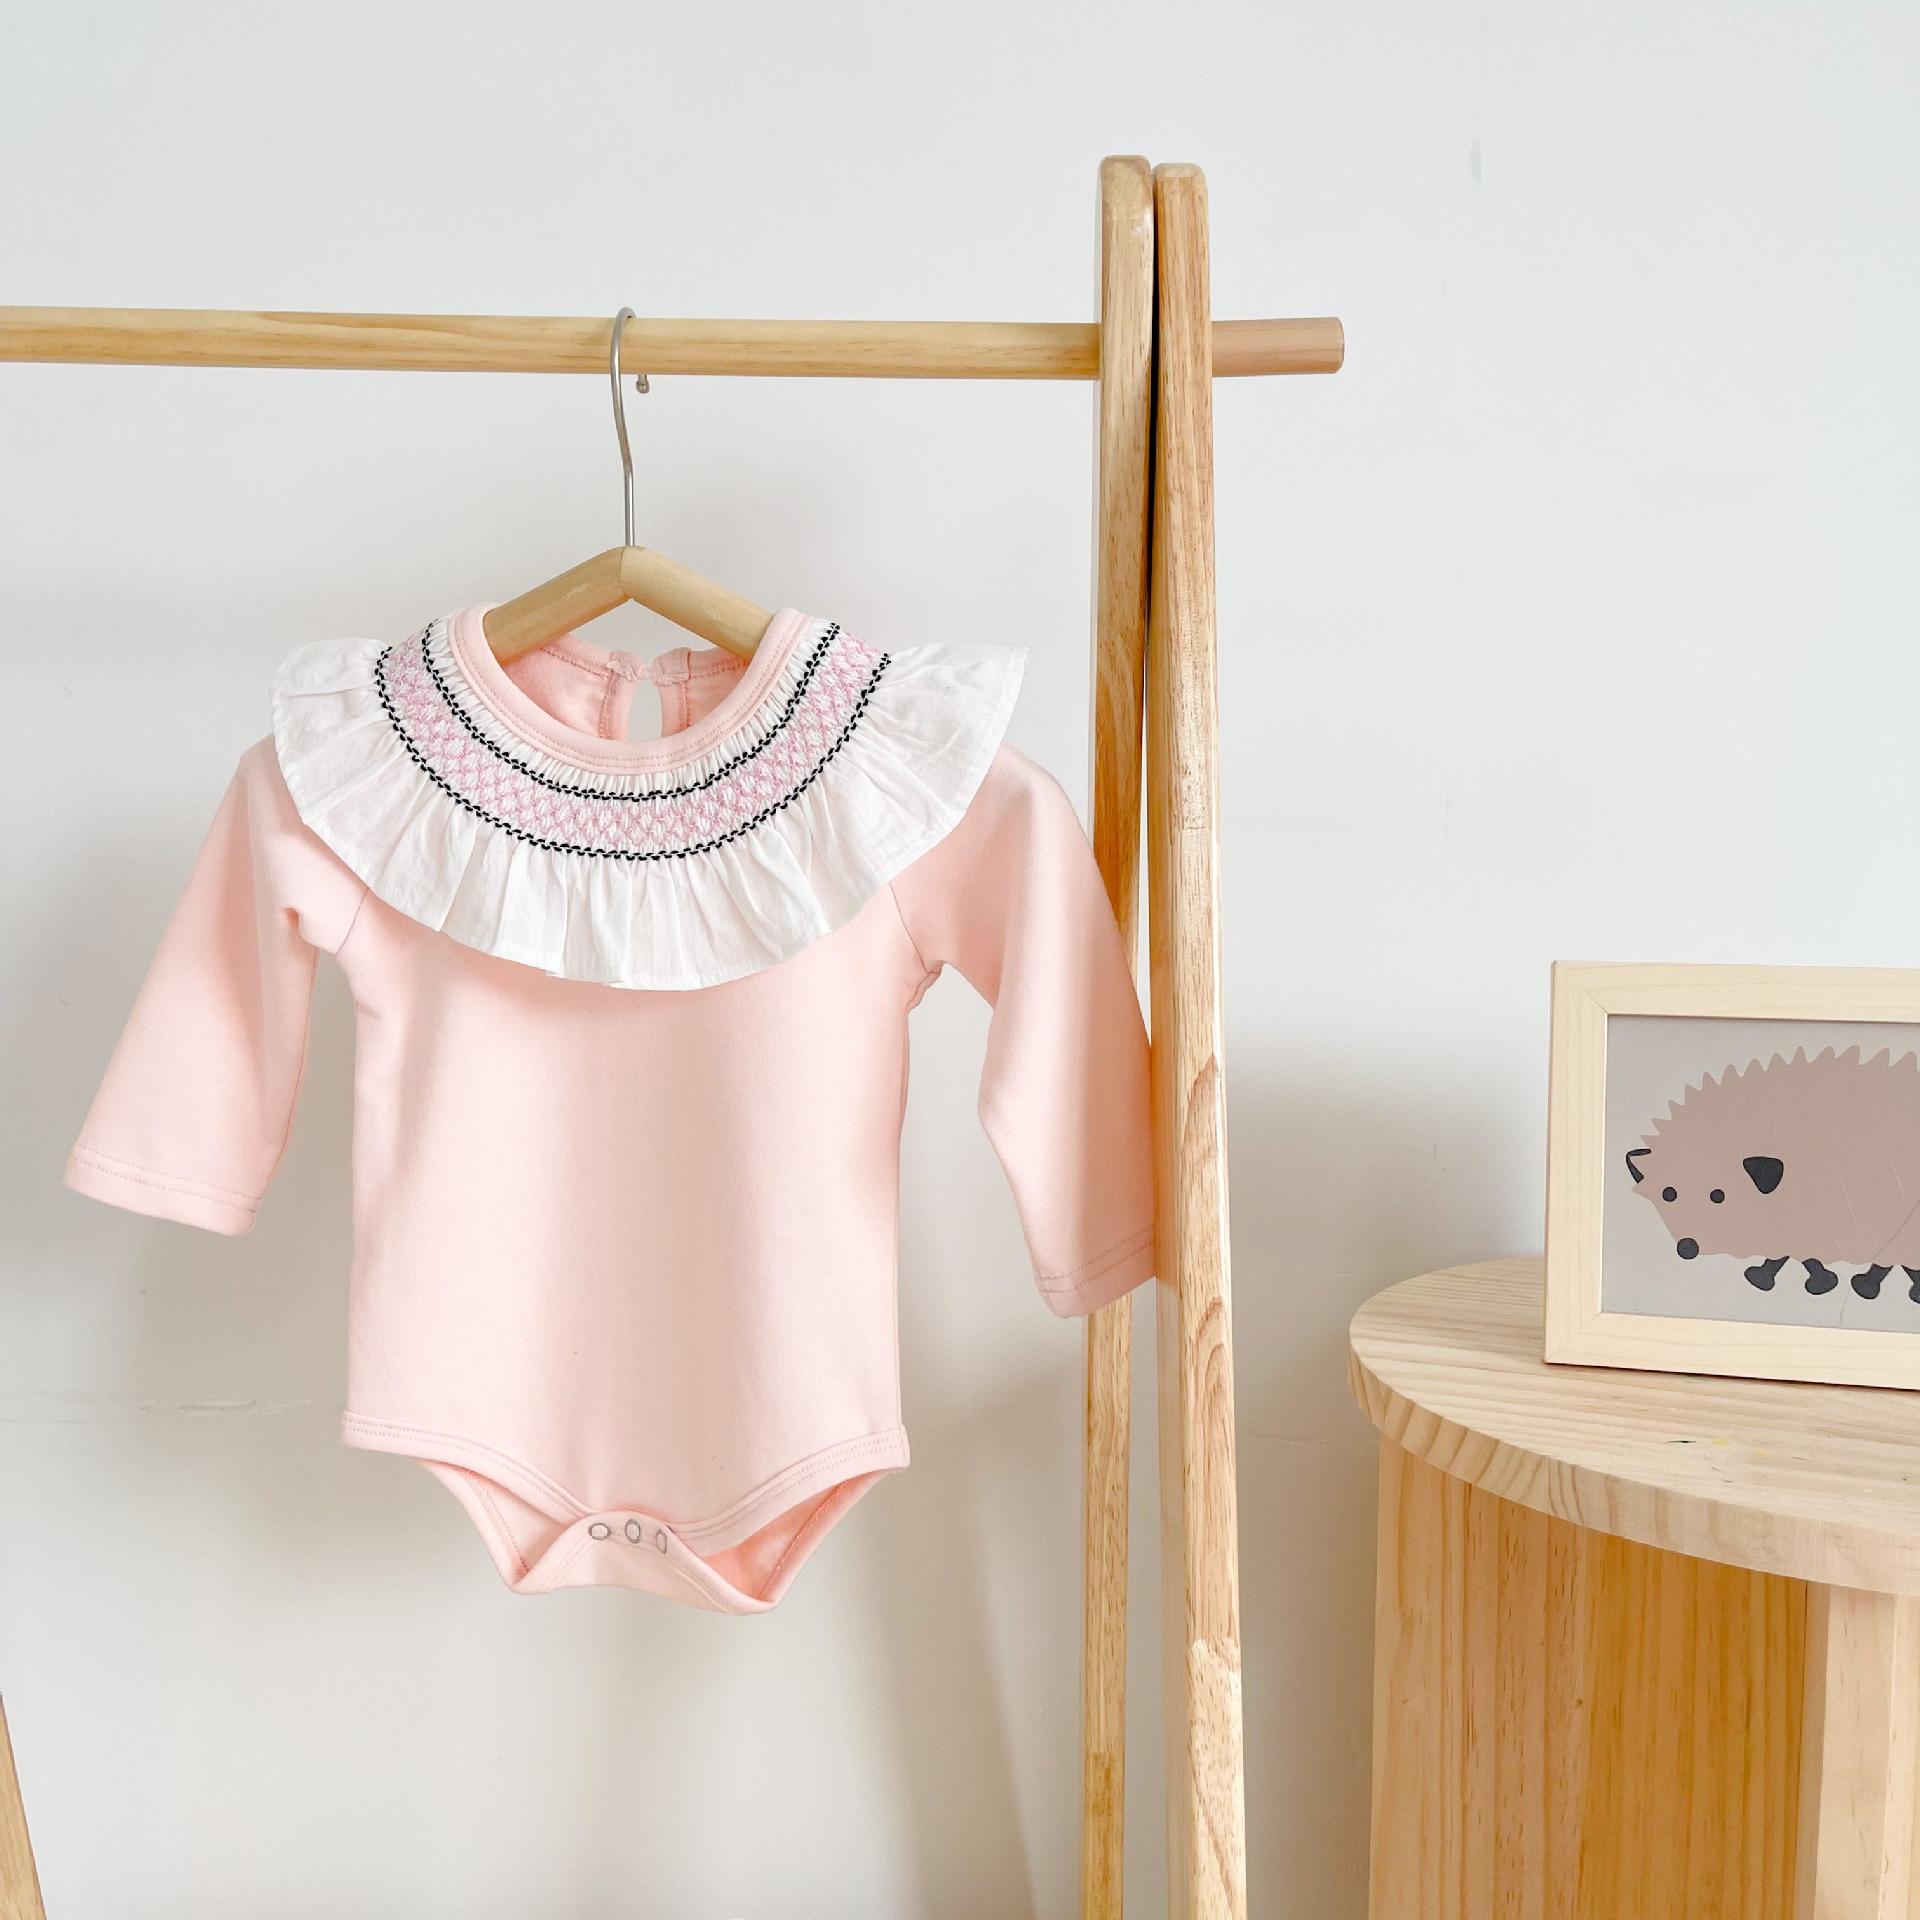 do bebê manga longa bodysuits roupas de bebê macacões